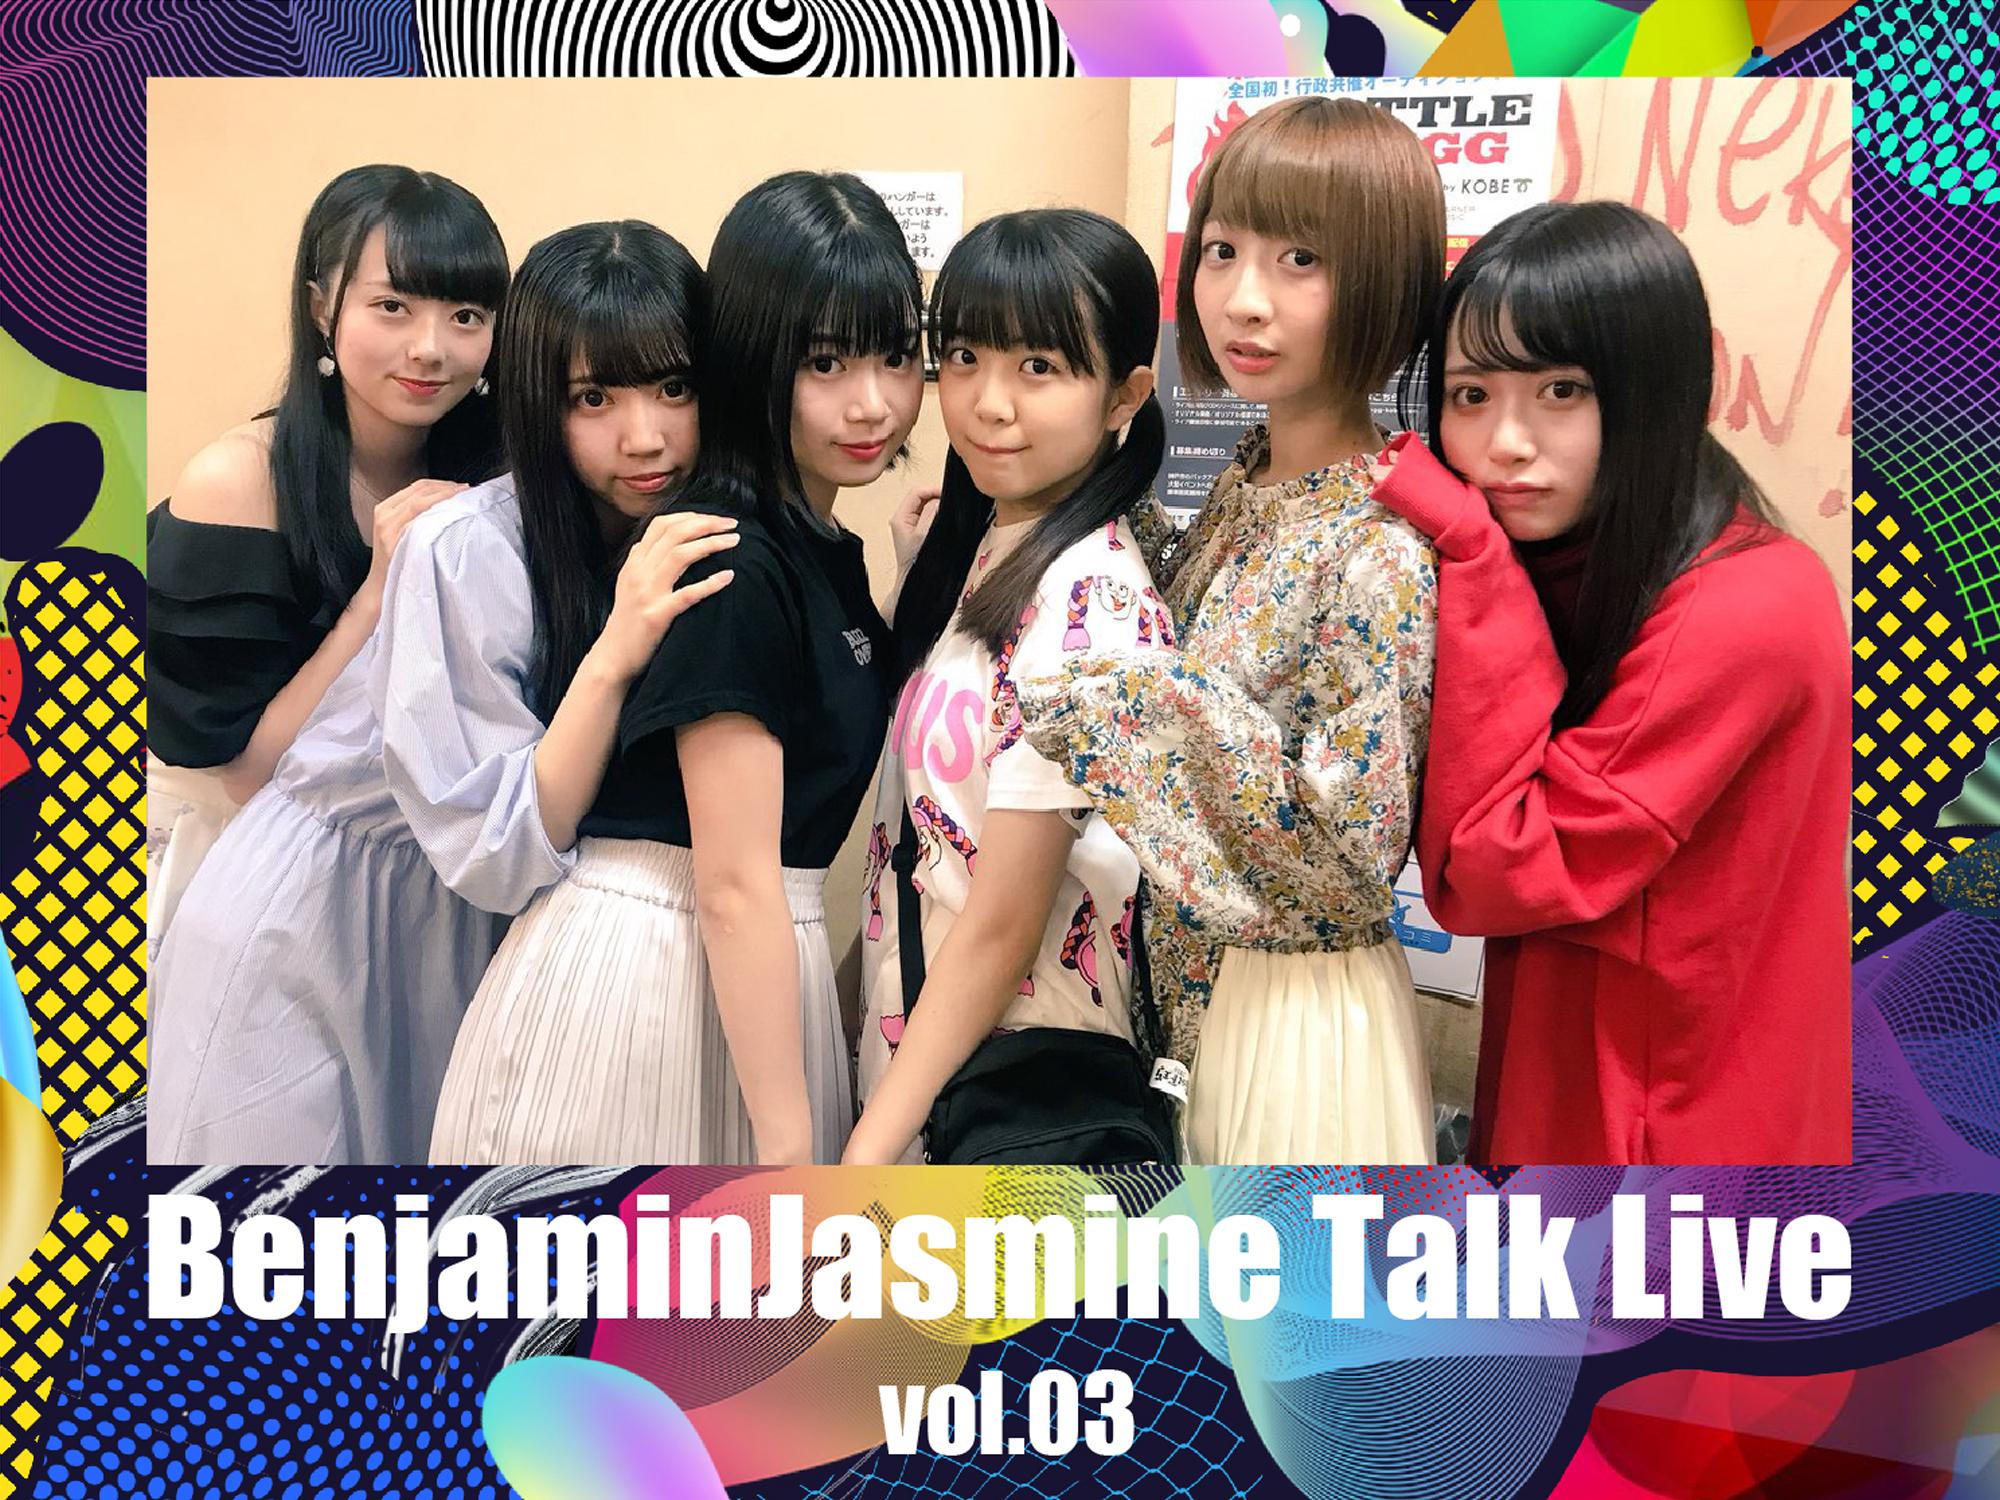 7月28日(日)『BenjaminJasmine Talk Live vol.03』開催決定